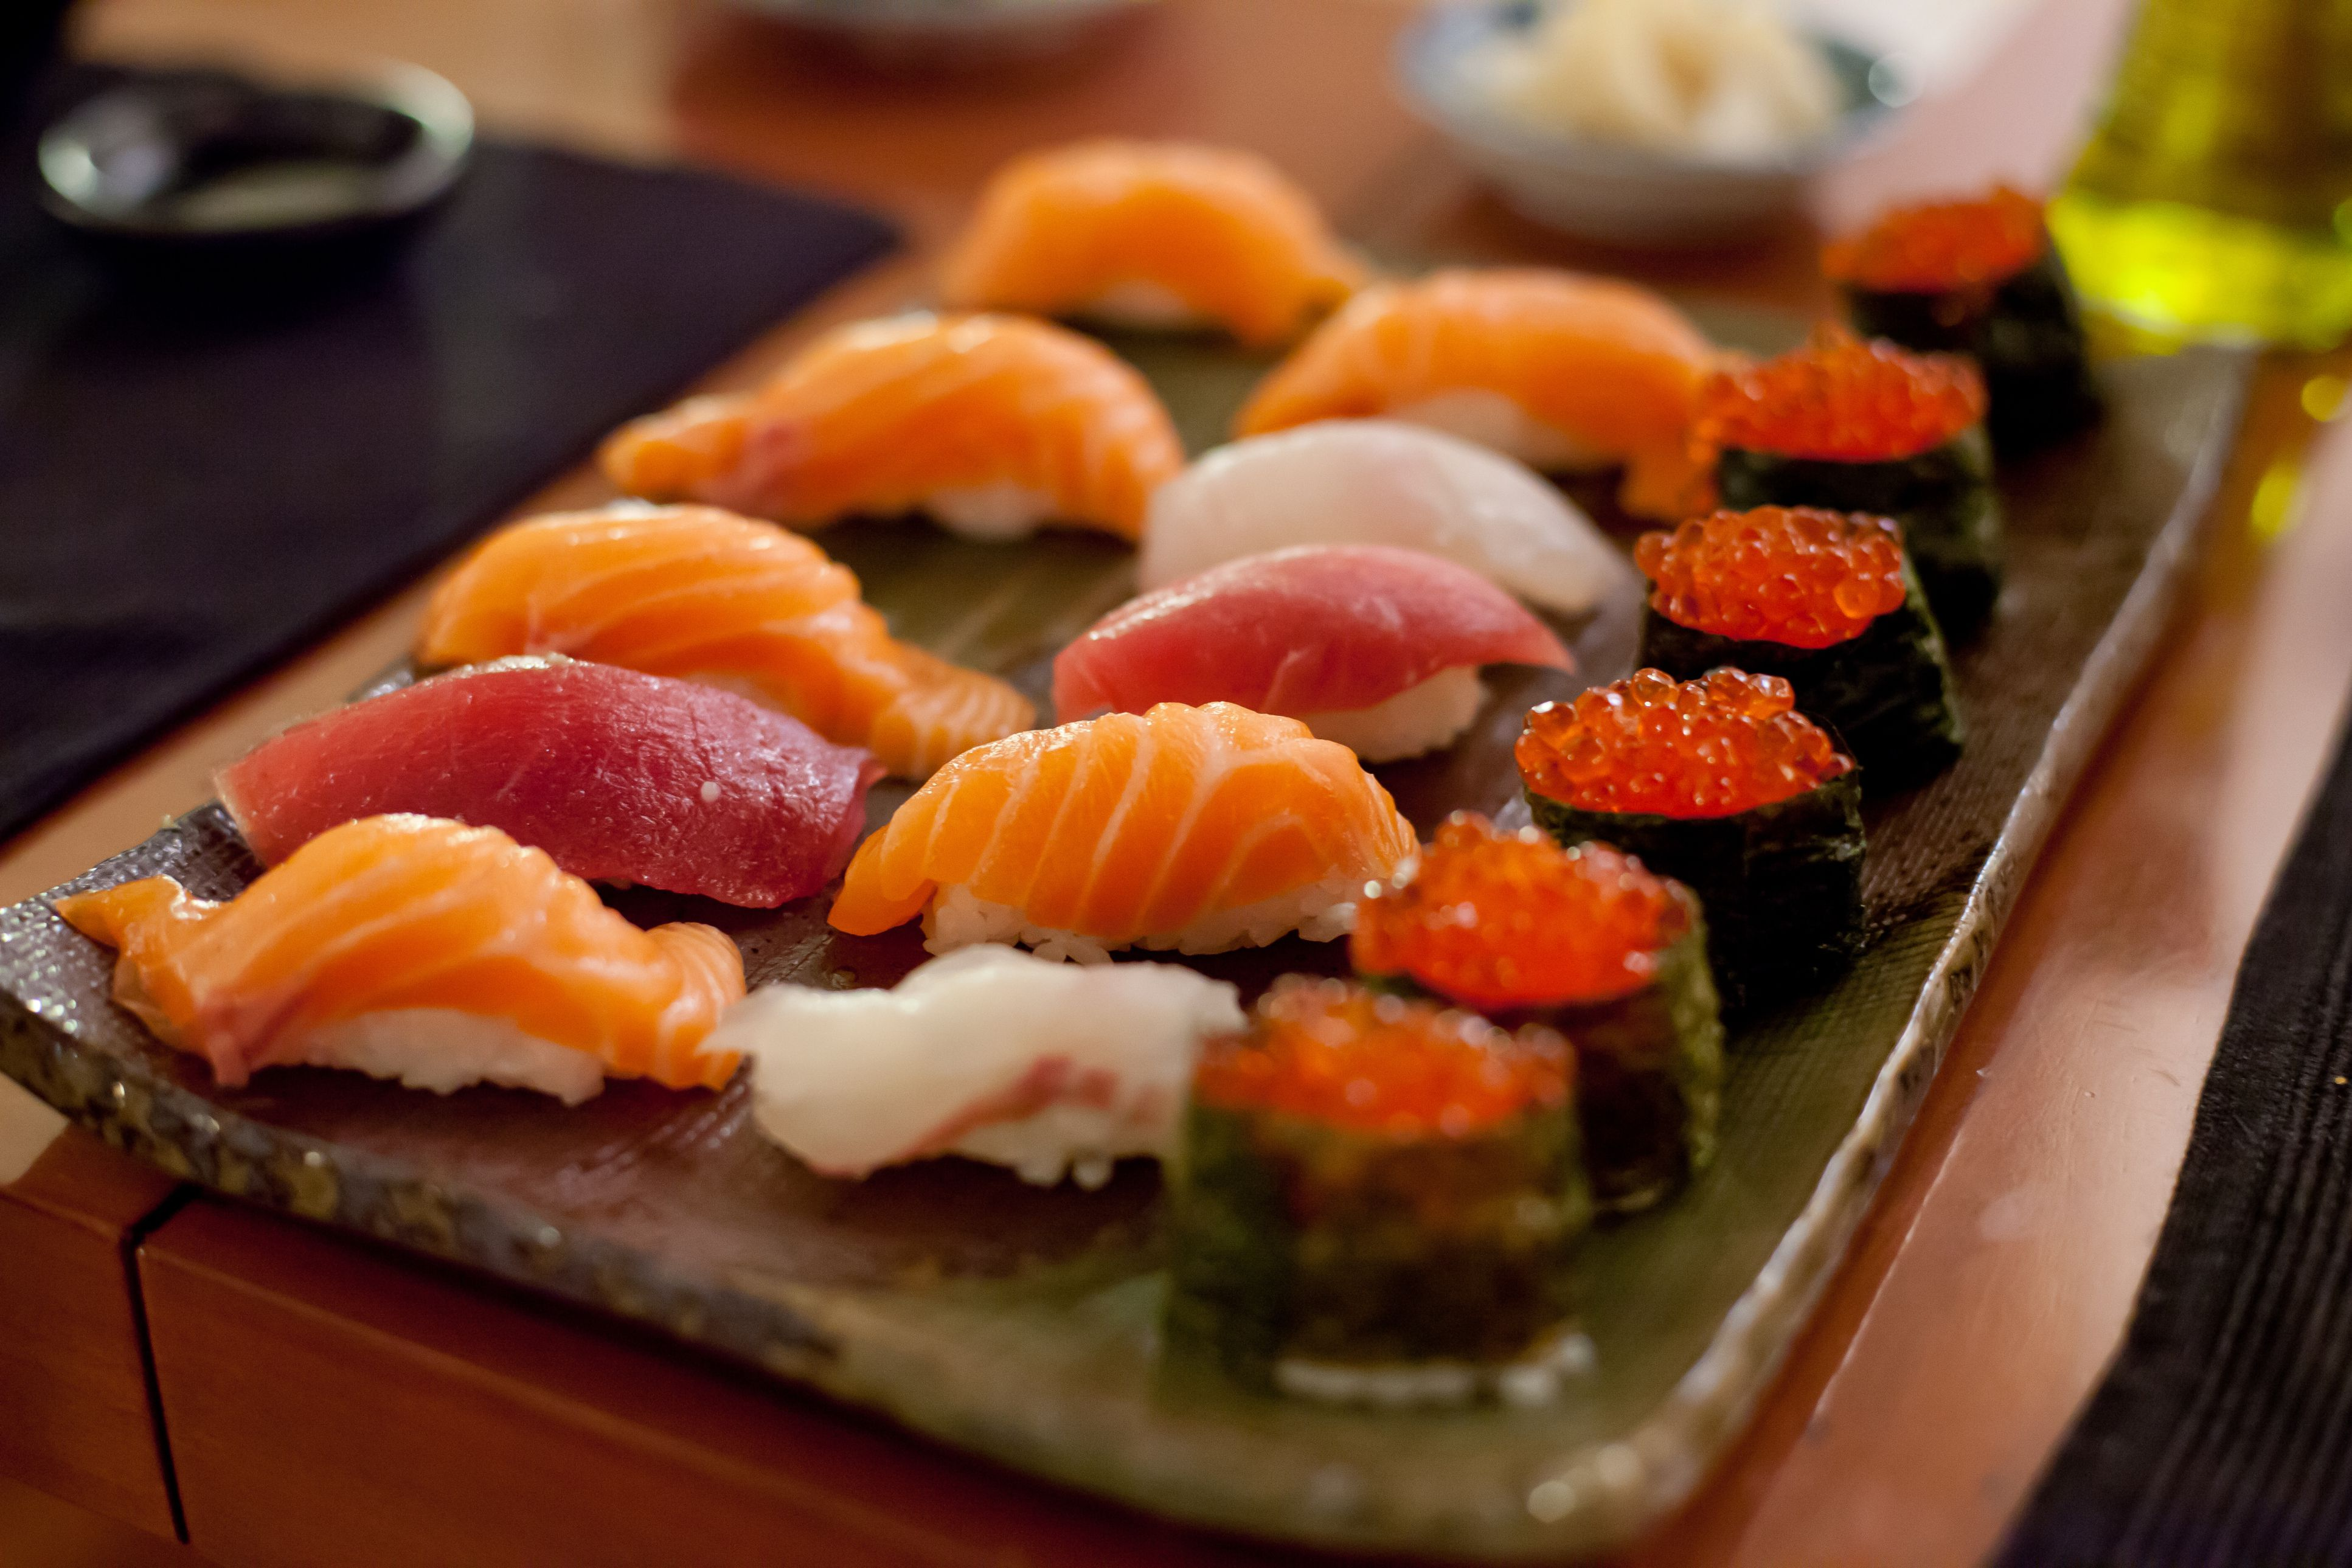 sushi-plate-56a378d33df78cf7727d84f9.jpg